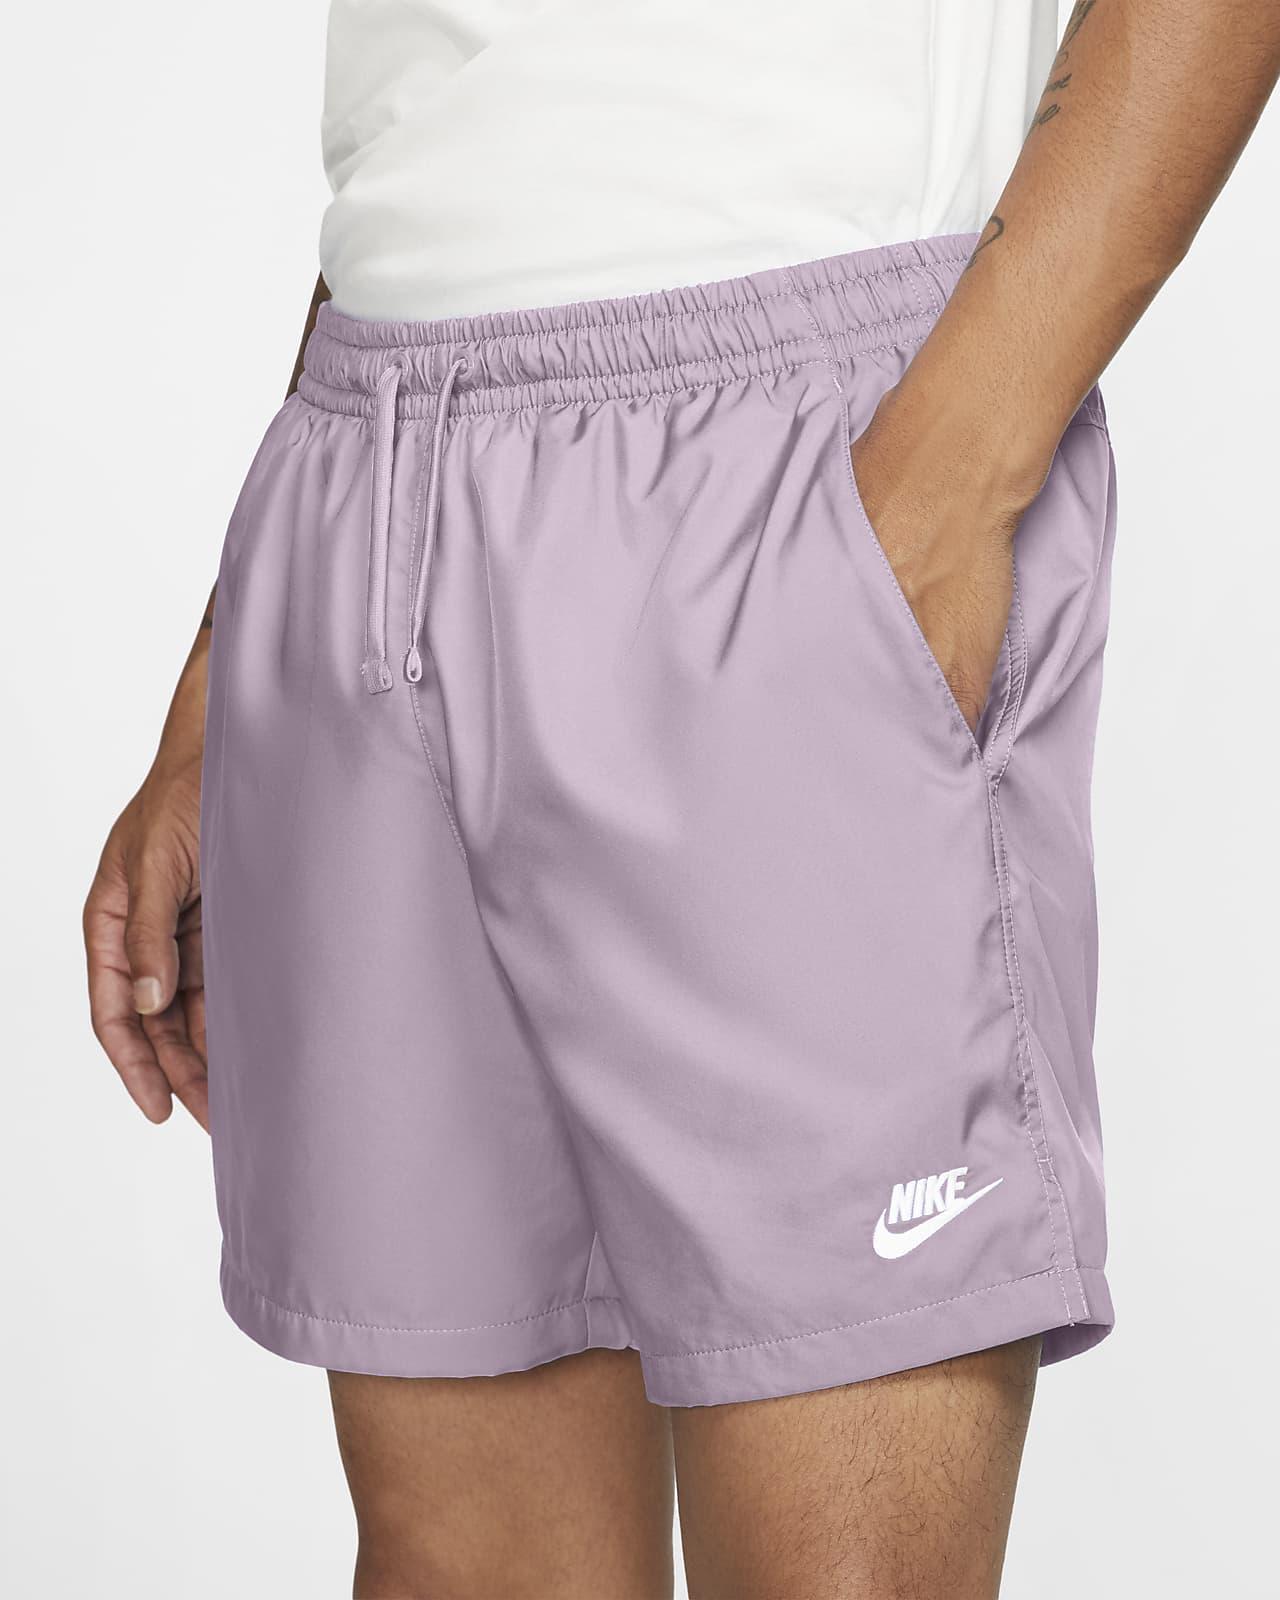 Nike Sportswear szőtt férfi rövidnadrág